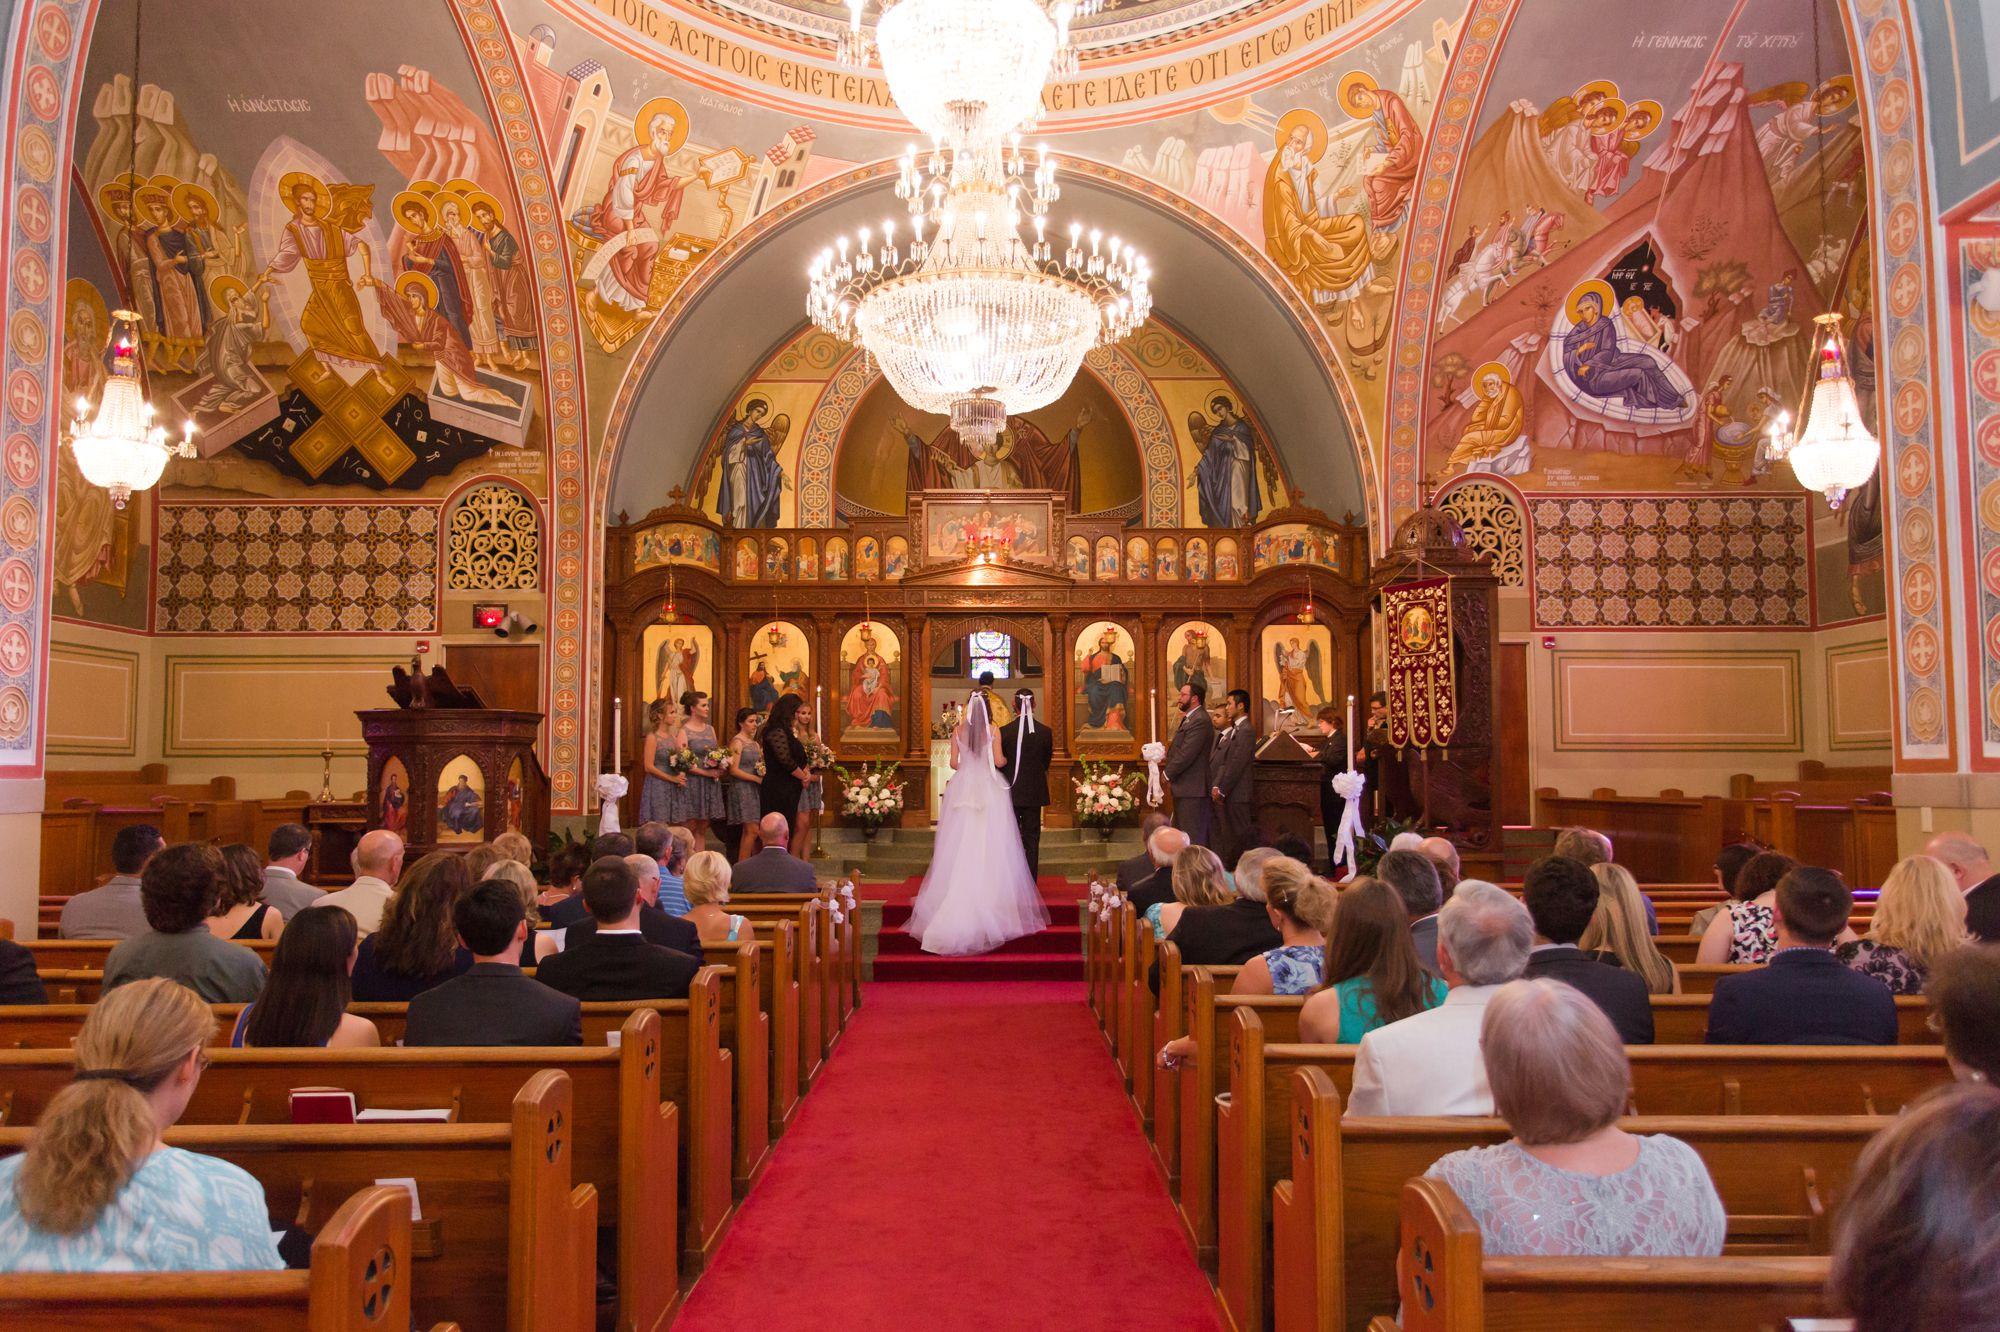 uptown-charlotte-orthodox-greek-wedding 64